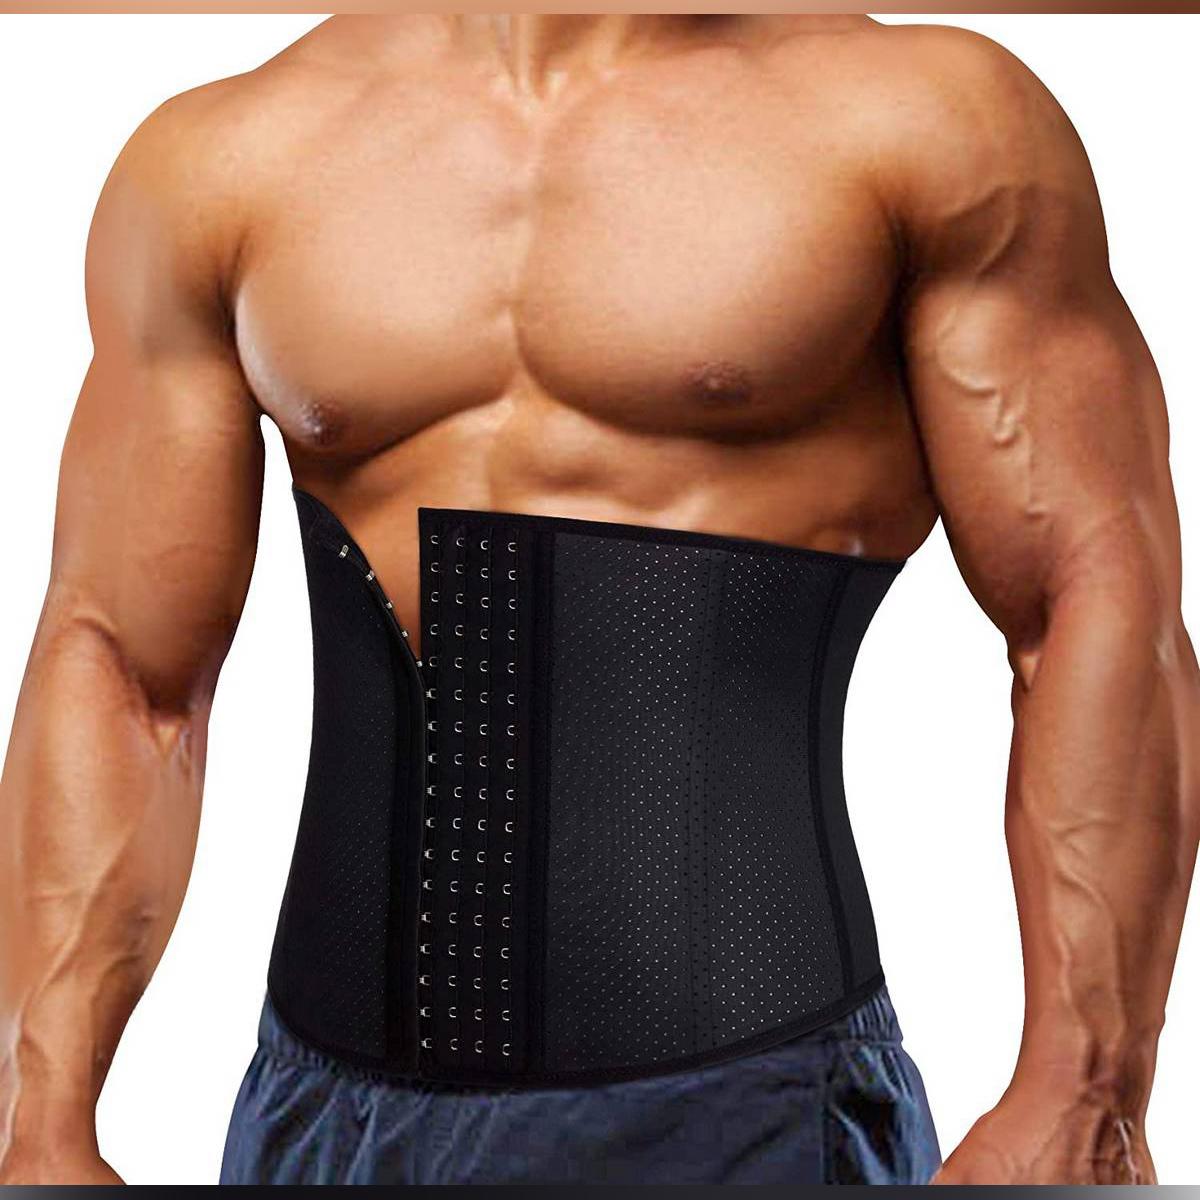 Latex Waist Trainer Belt for Men Body Weight Loss Hot Sweat Fat Burning Shaper Workout Trimmer Band